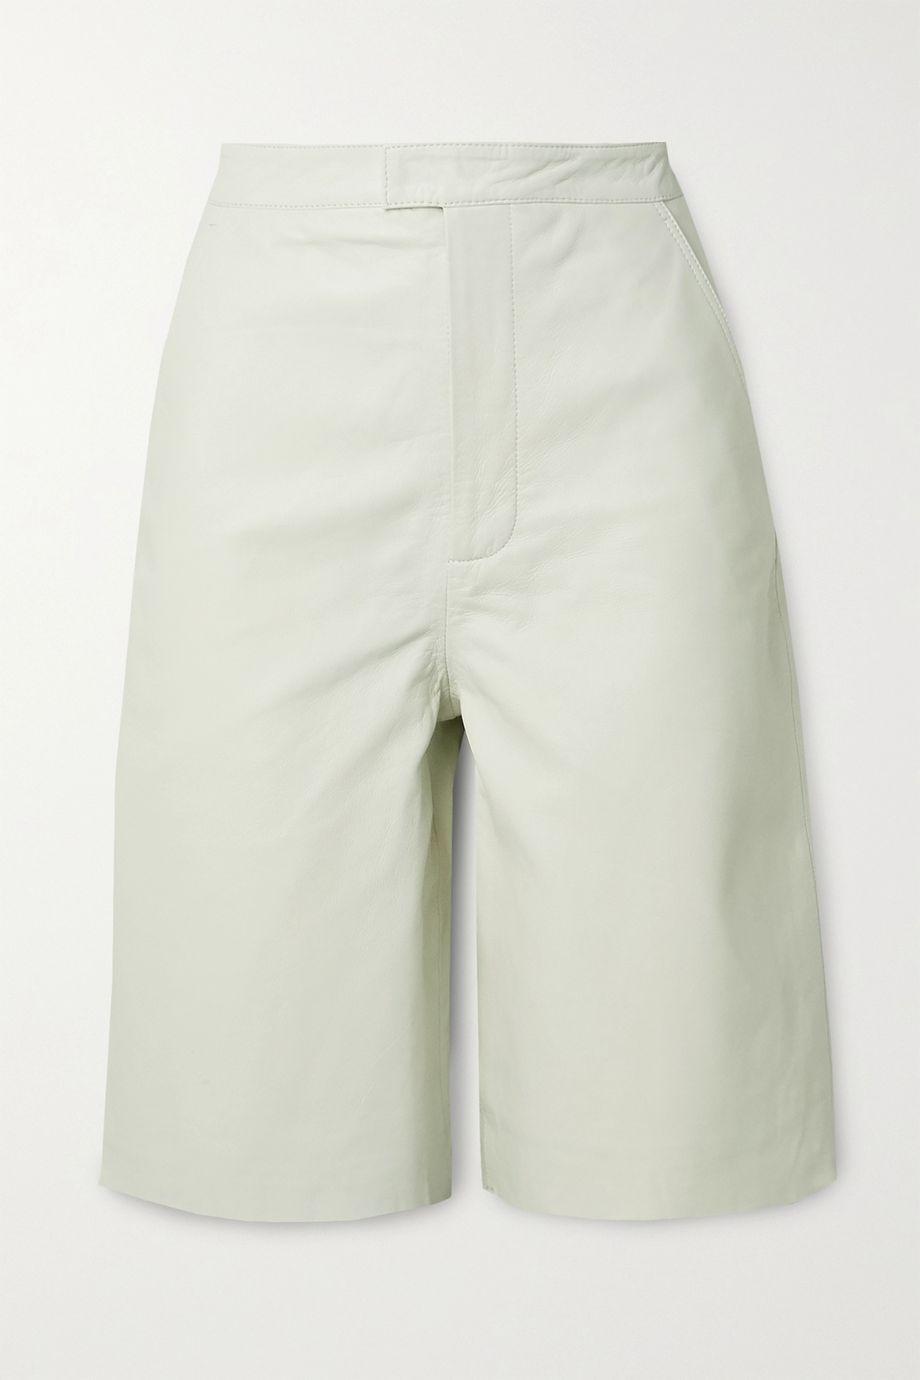 REMAIN Birger Christensen Manu leather shorts